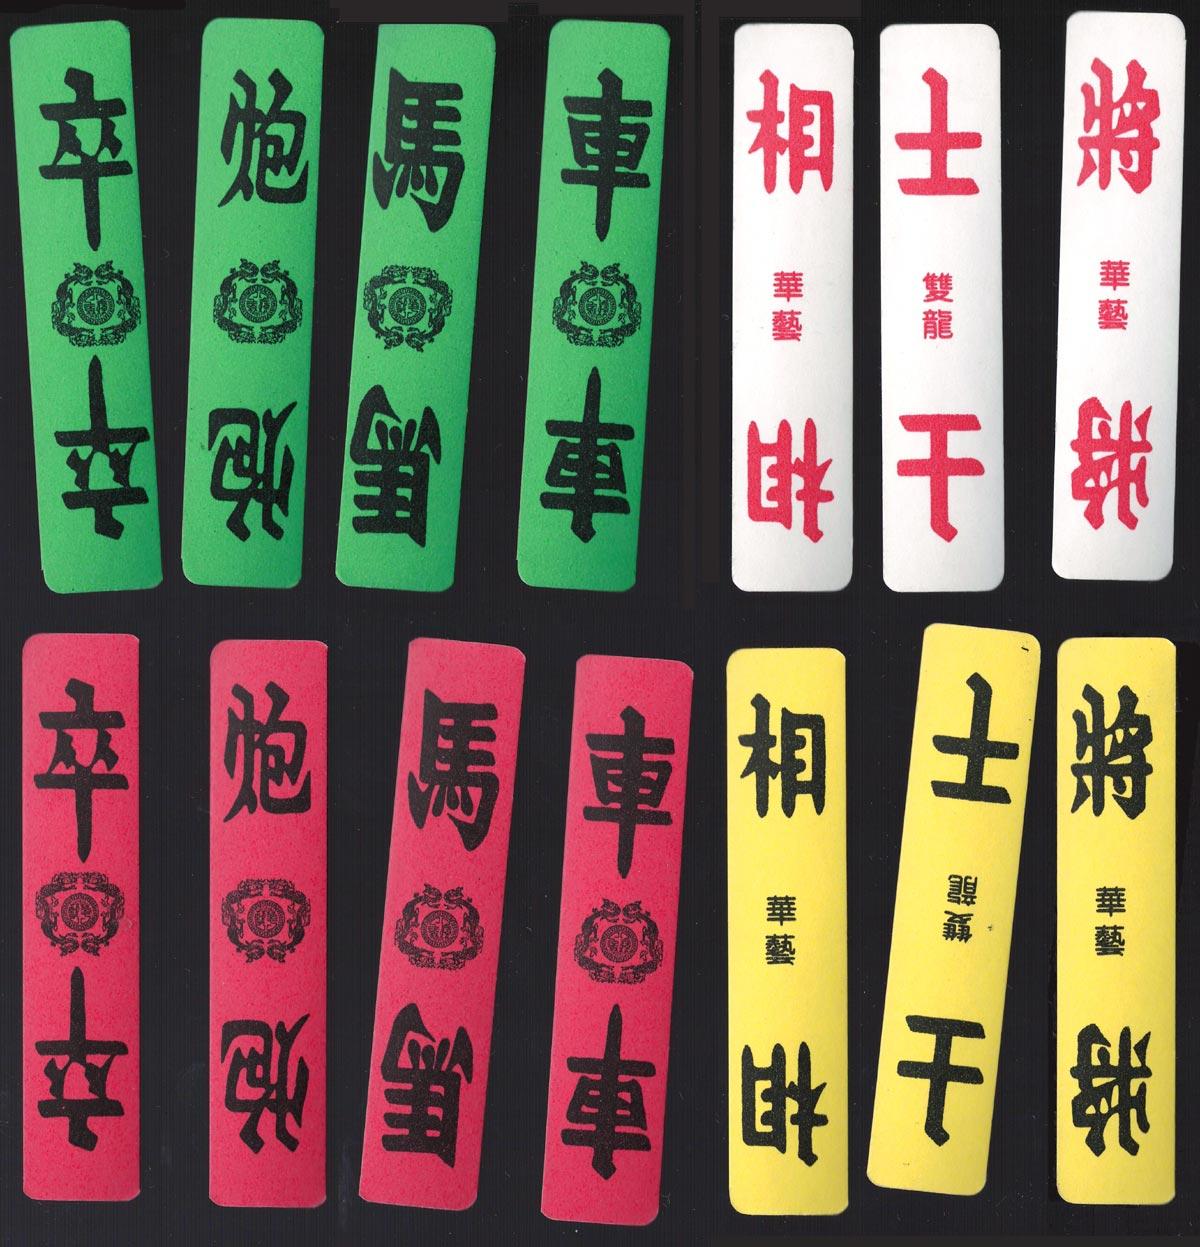 Four-colour cards by Hua Goi (華藝) Pte Ltd